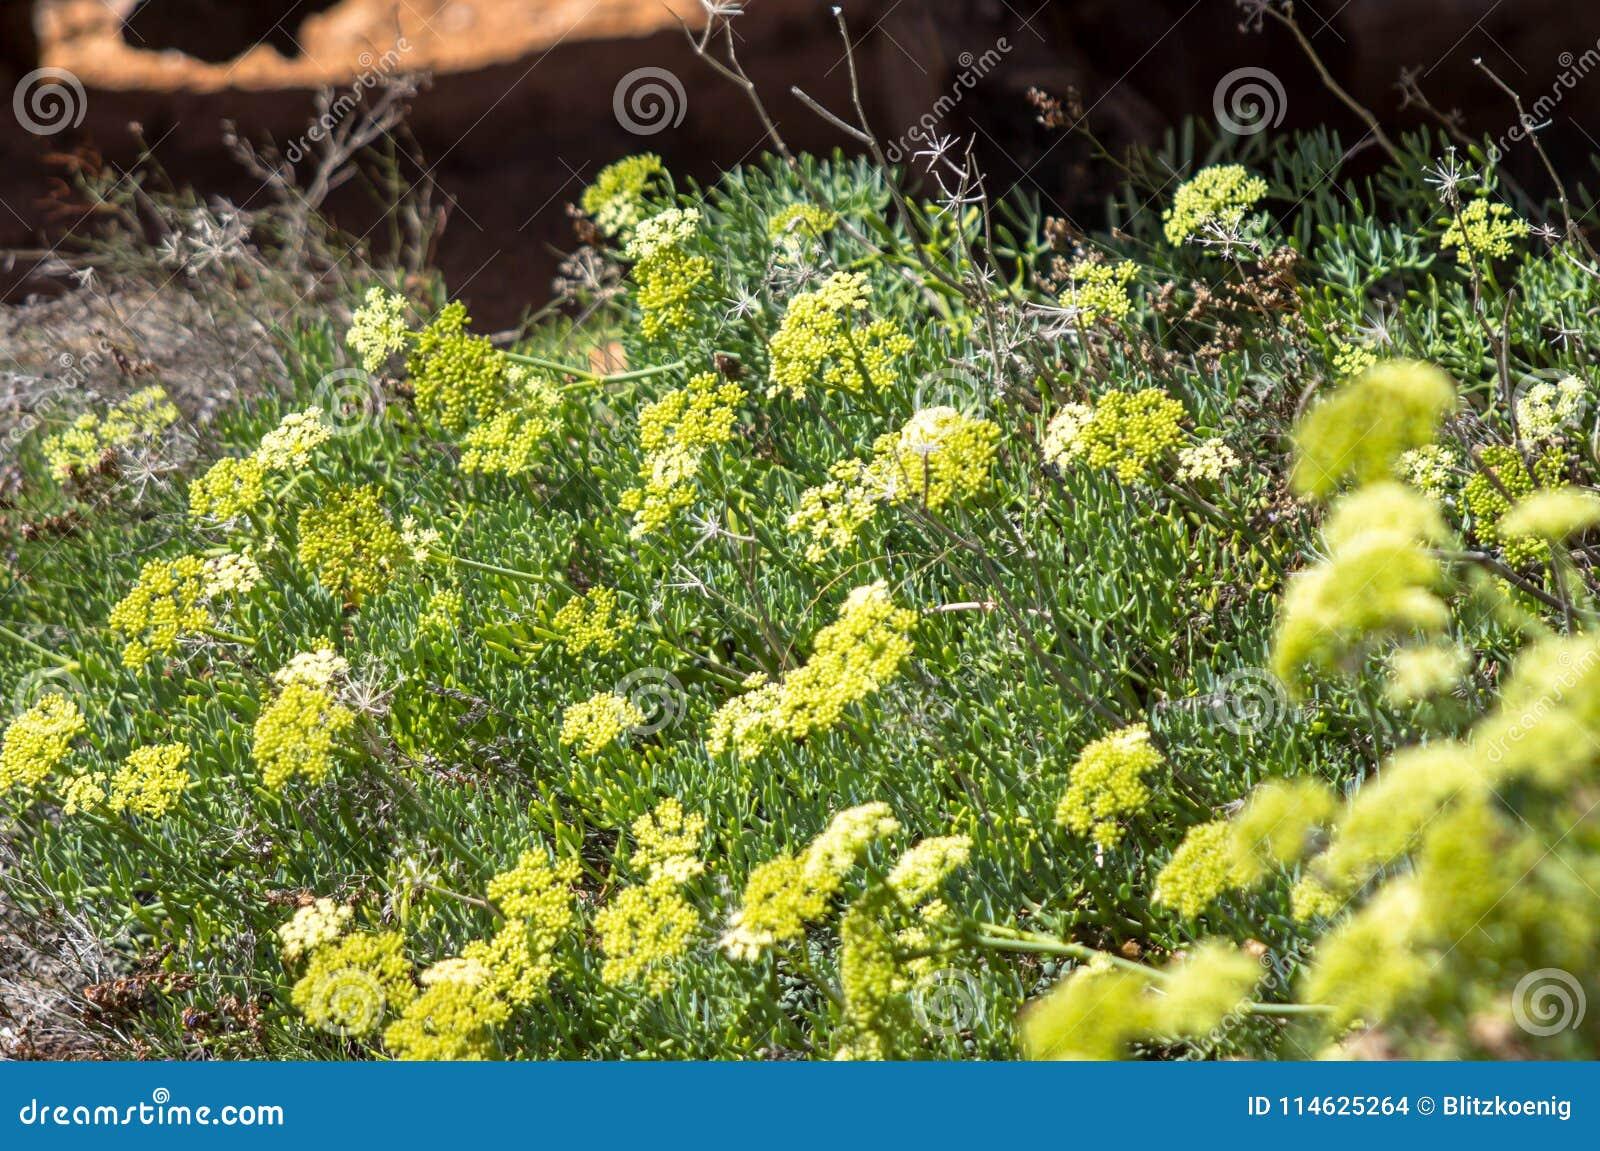 Yellow Flowering Shrubs Stock Photo Image Of Blooming 114625264